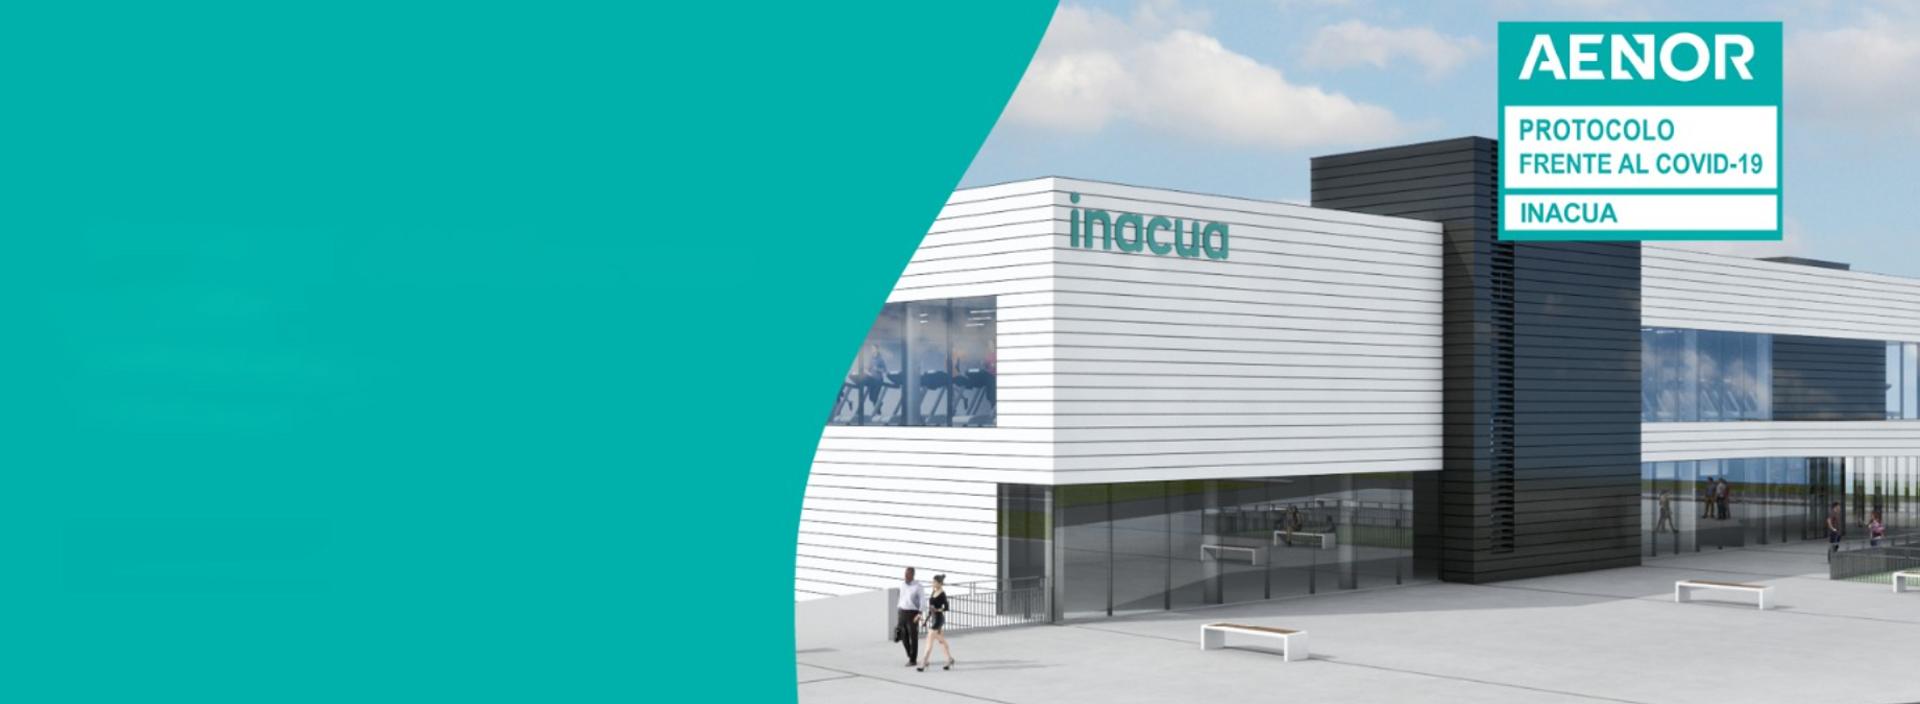 banner-web-Home-Inacua-Alcorcon-ene